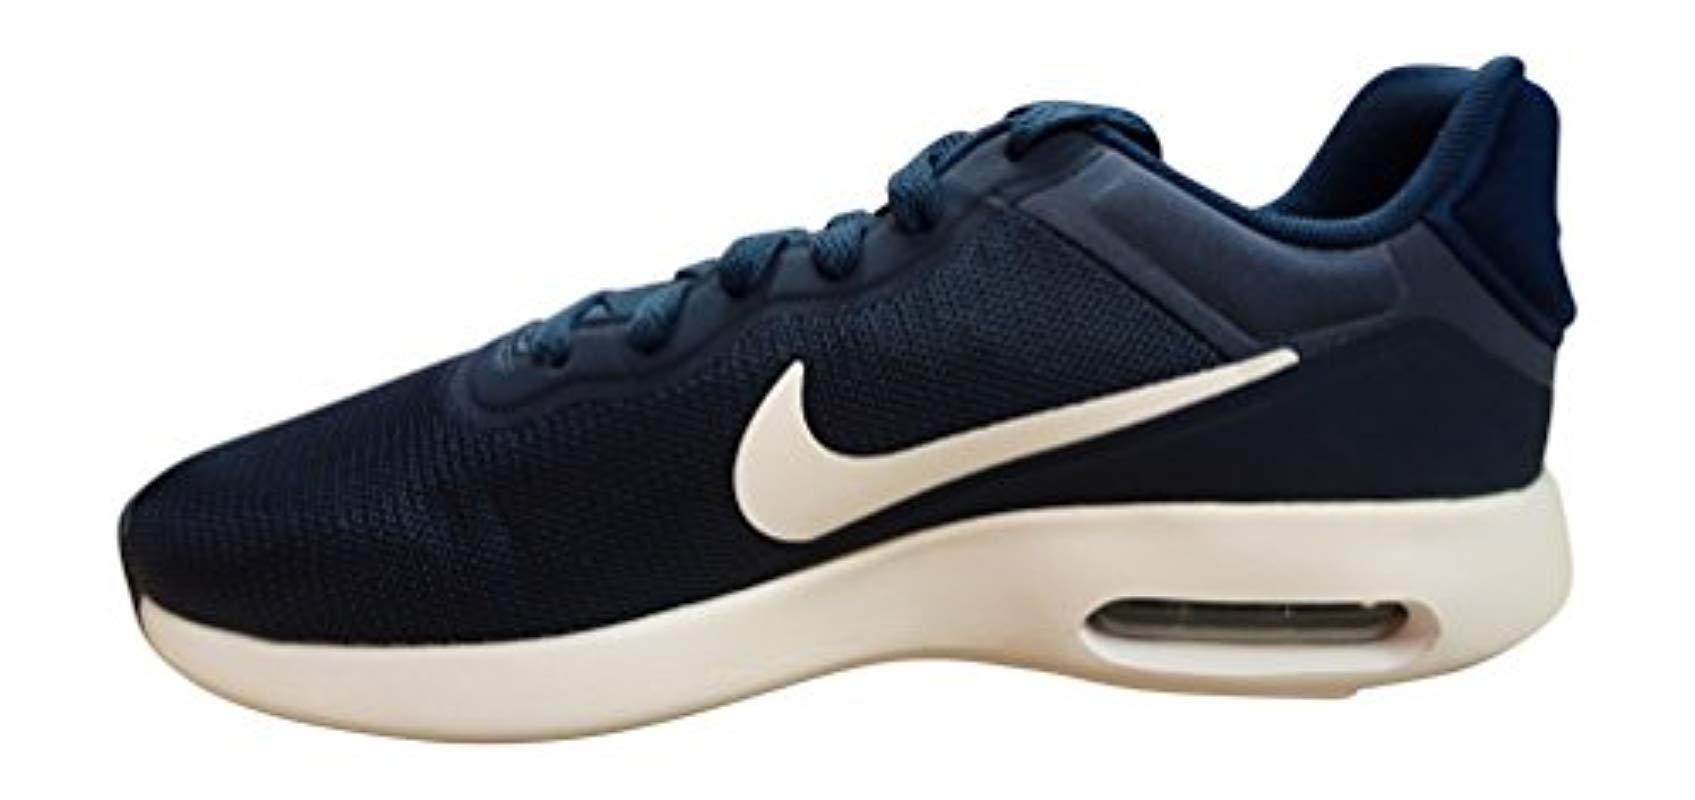 ... aliexpress nike blue s air max modern essential low top sneakers for  men . view fullscreen 5ae18ffe9